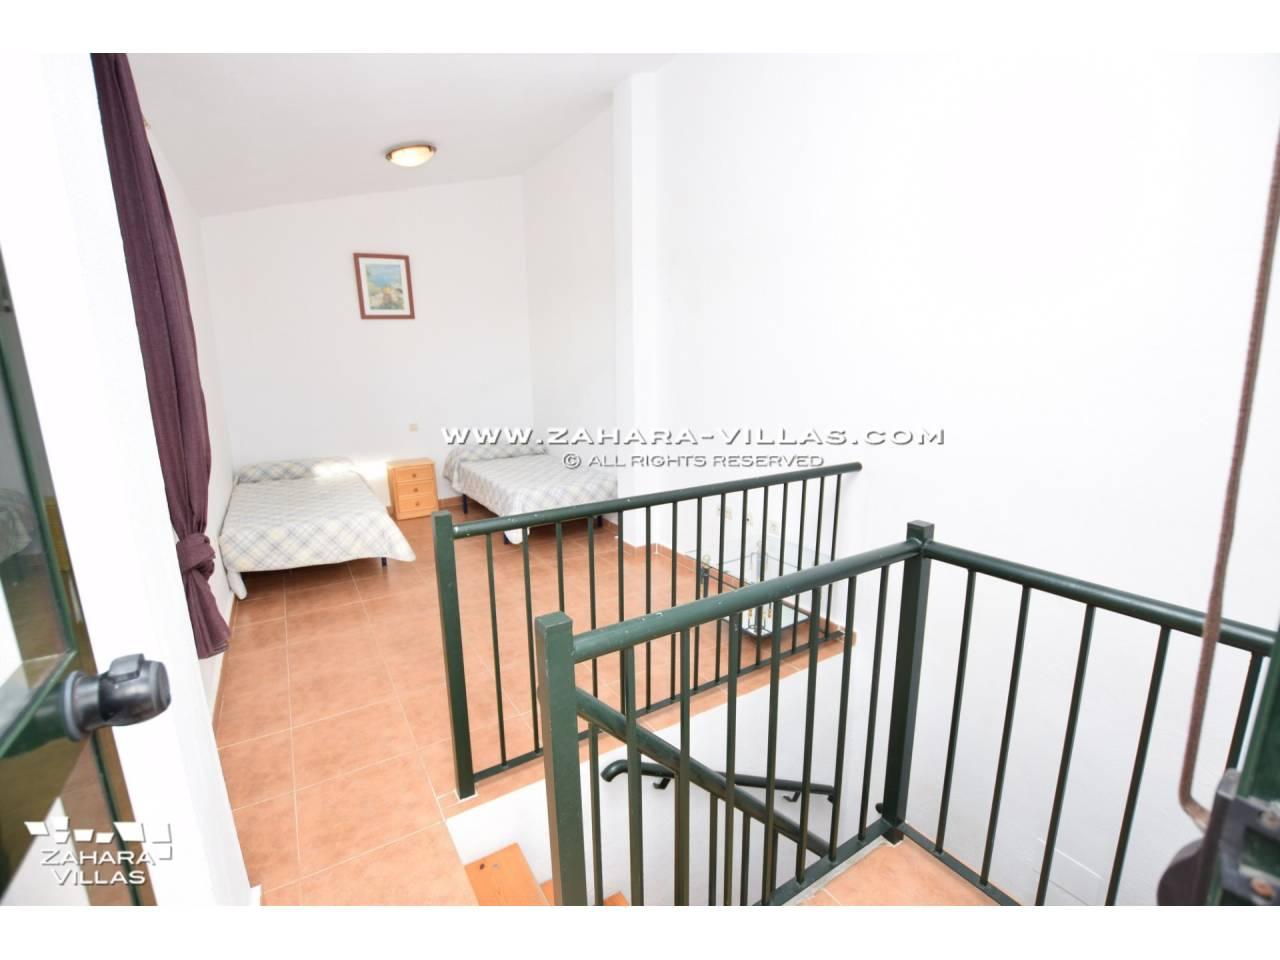 Imagen 24 de Penthouse for sale in Zahara de los Atunes